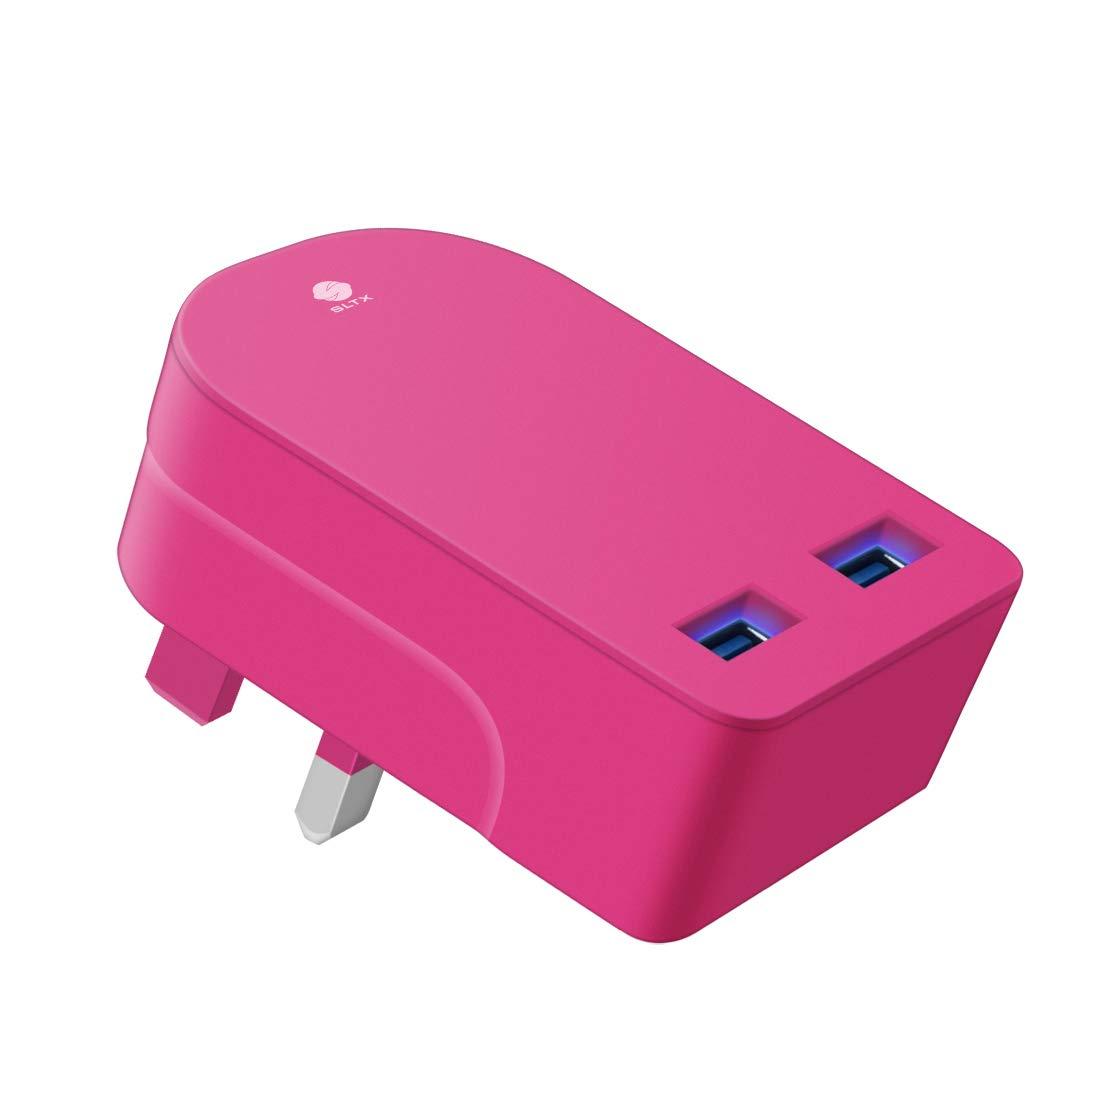 Dual Folding 3 Pin UK Plug 3100mAh Universal USB Charger With Smart IC UK Plug For iPhone//iPad//iPod//Samsung Galaxy Tab//HTC//Windows Phone//Tablet /& USB White